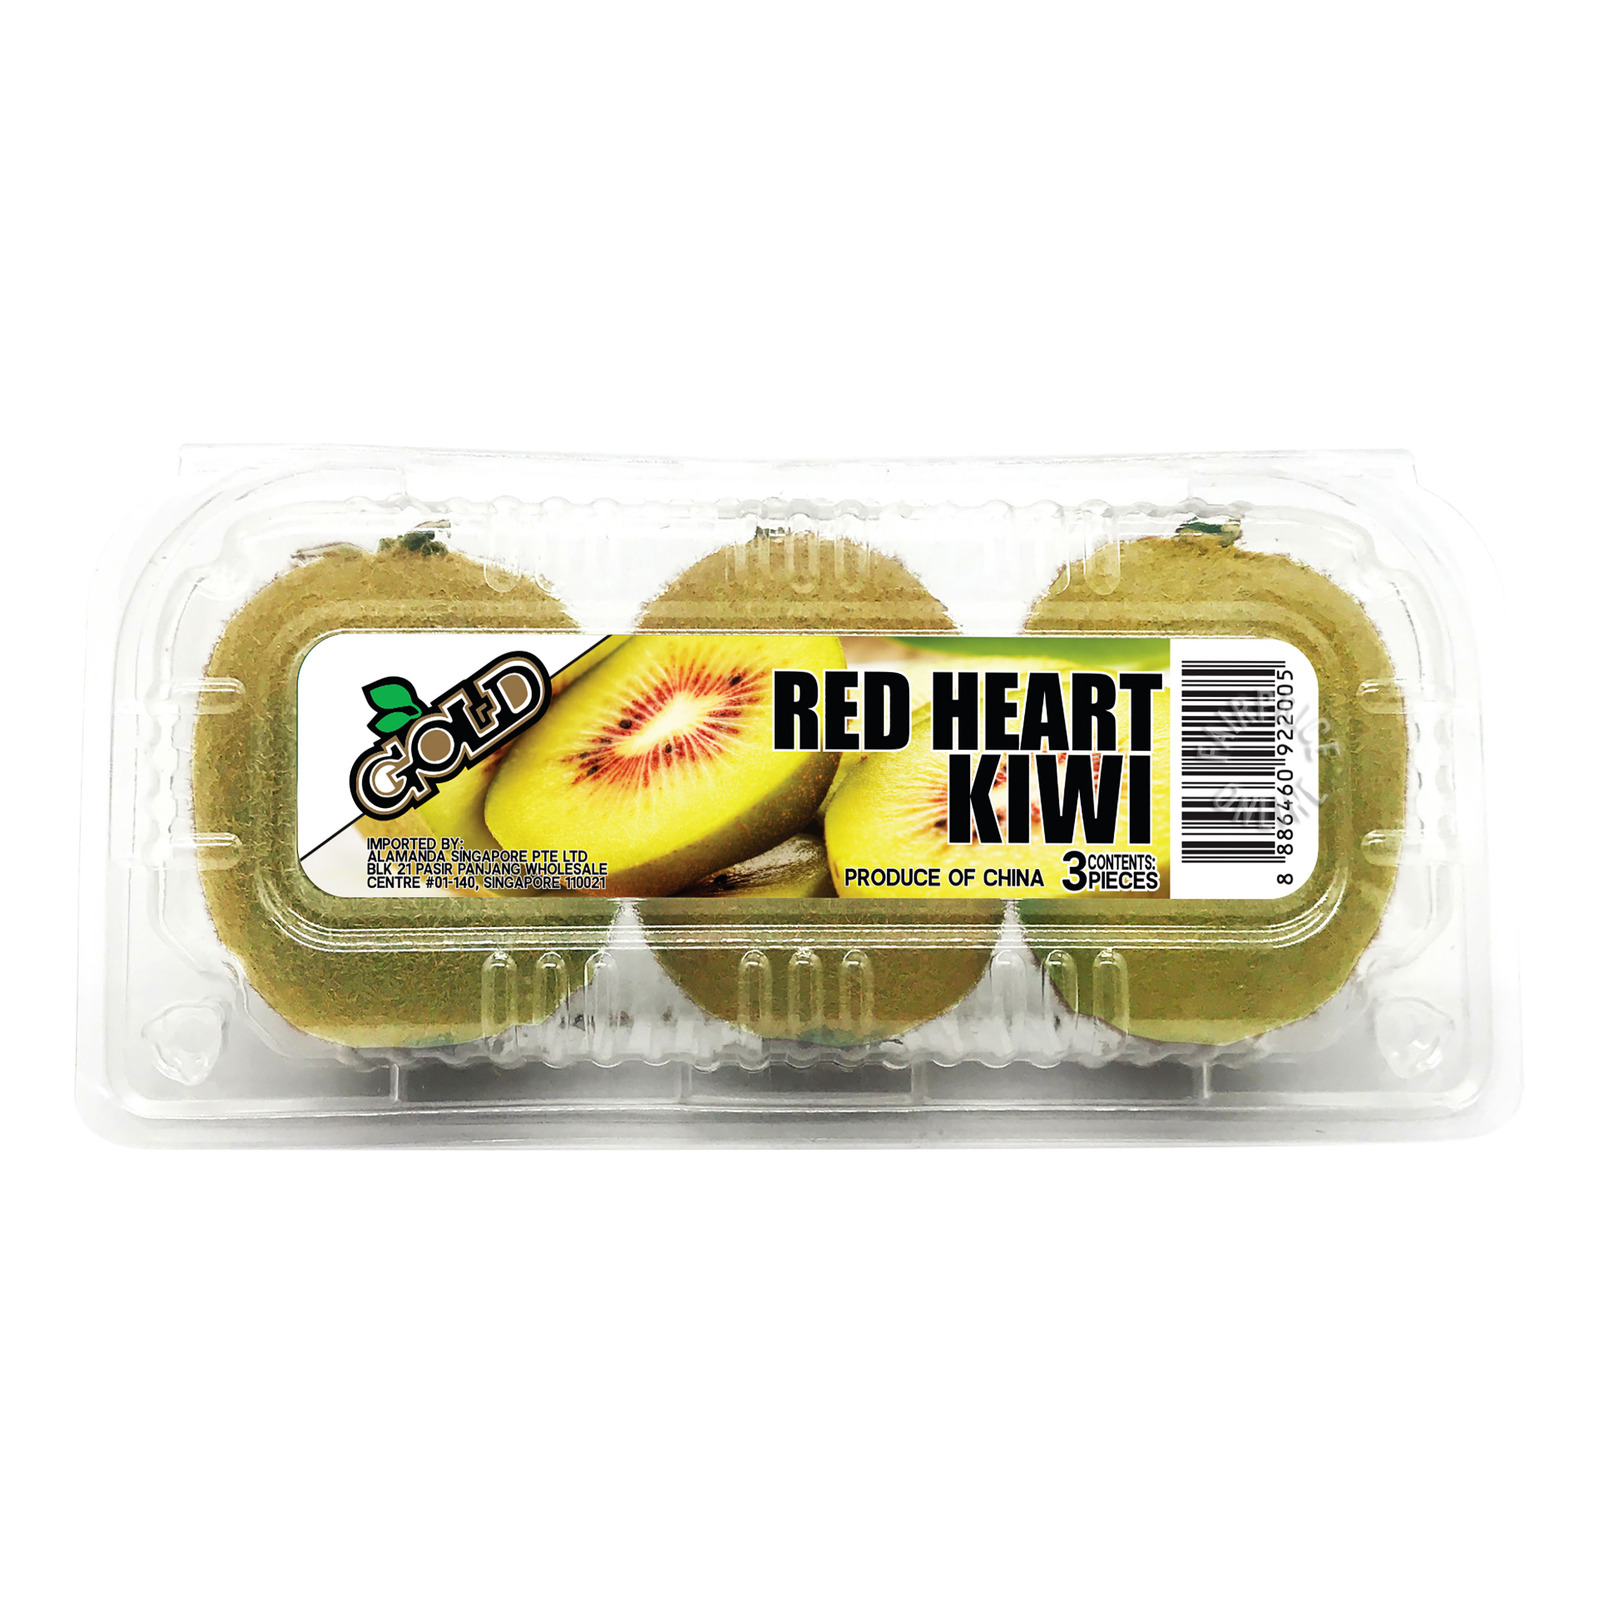 Gold China Red Heart Kiwi